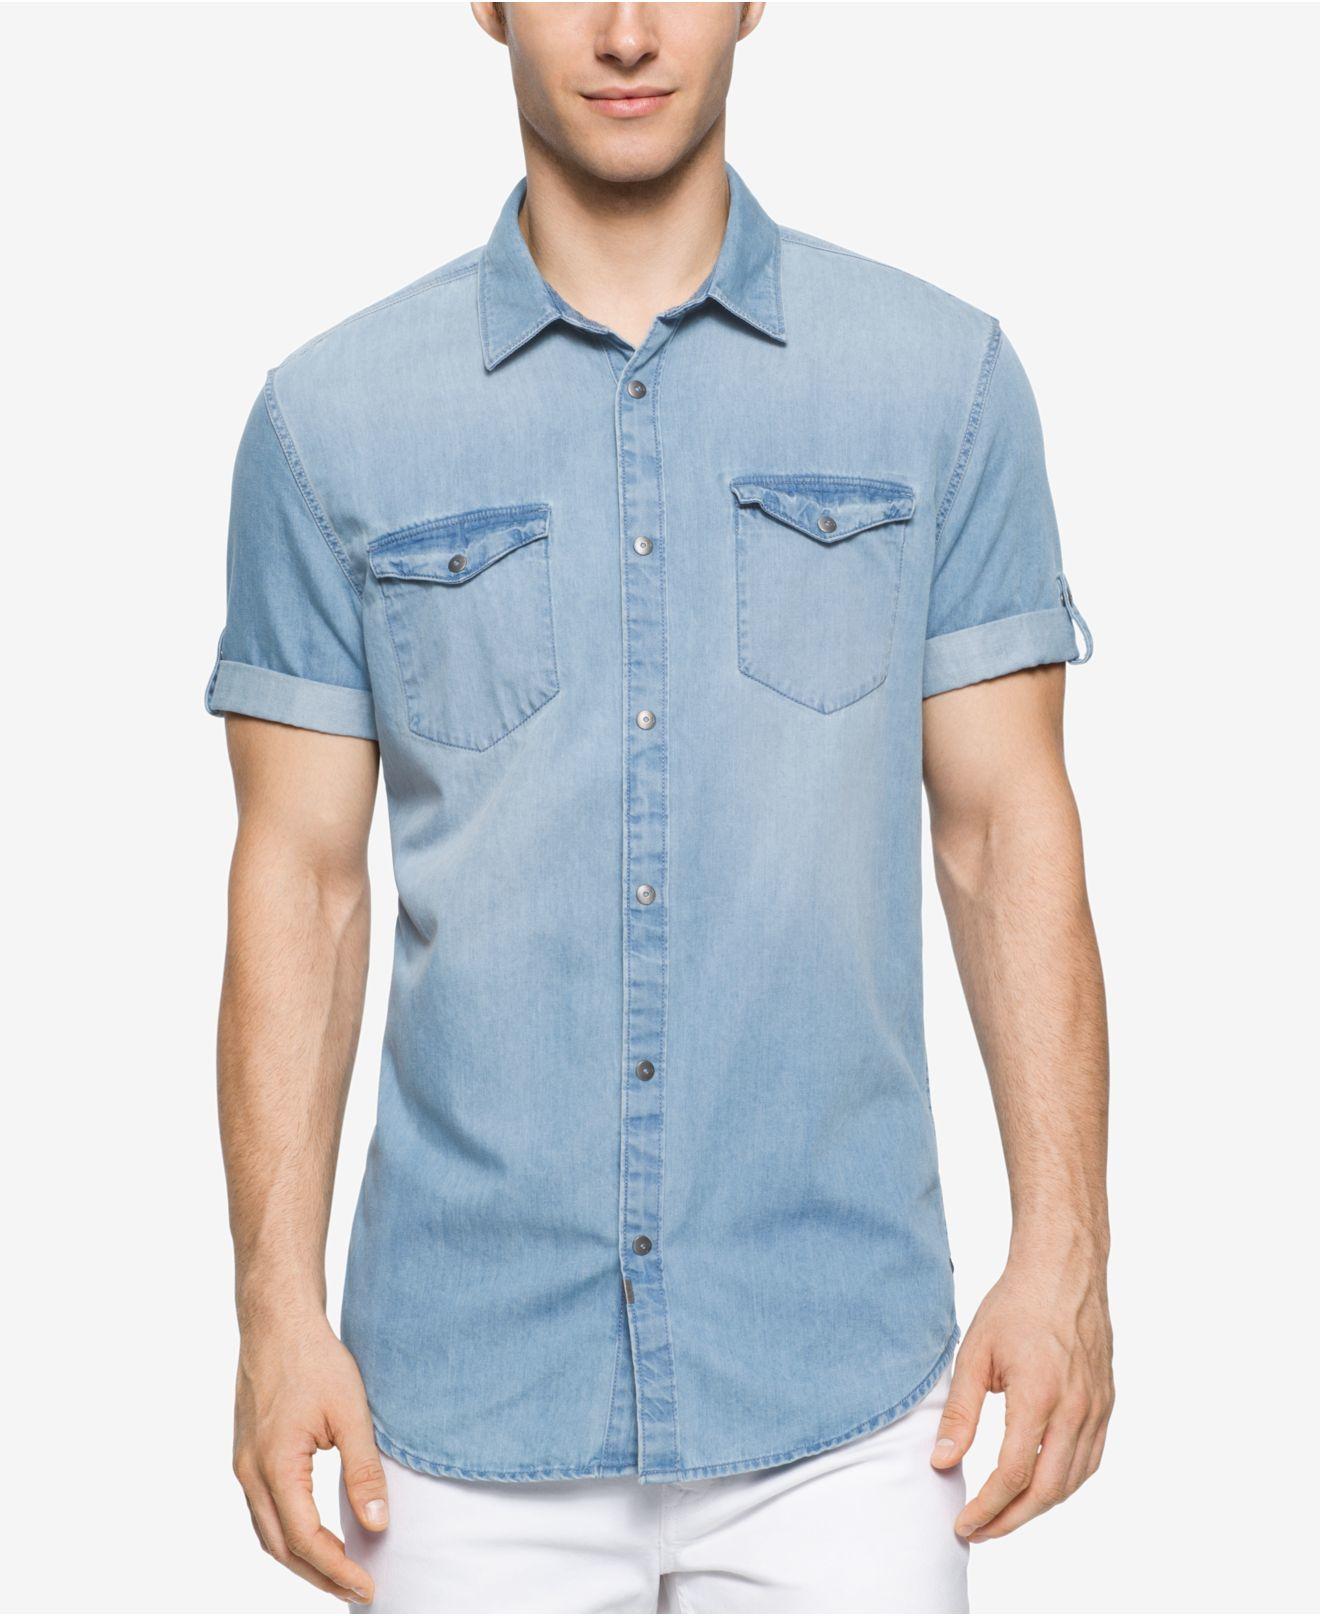 calvin klein denim shirt mens